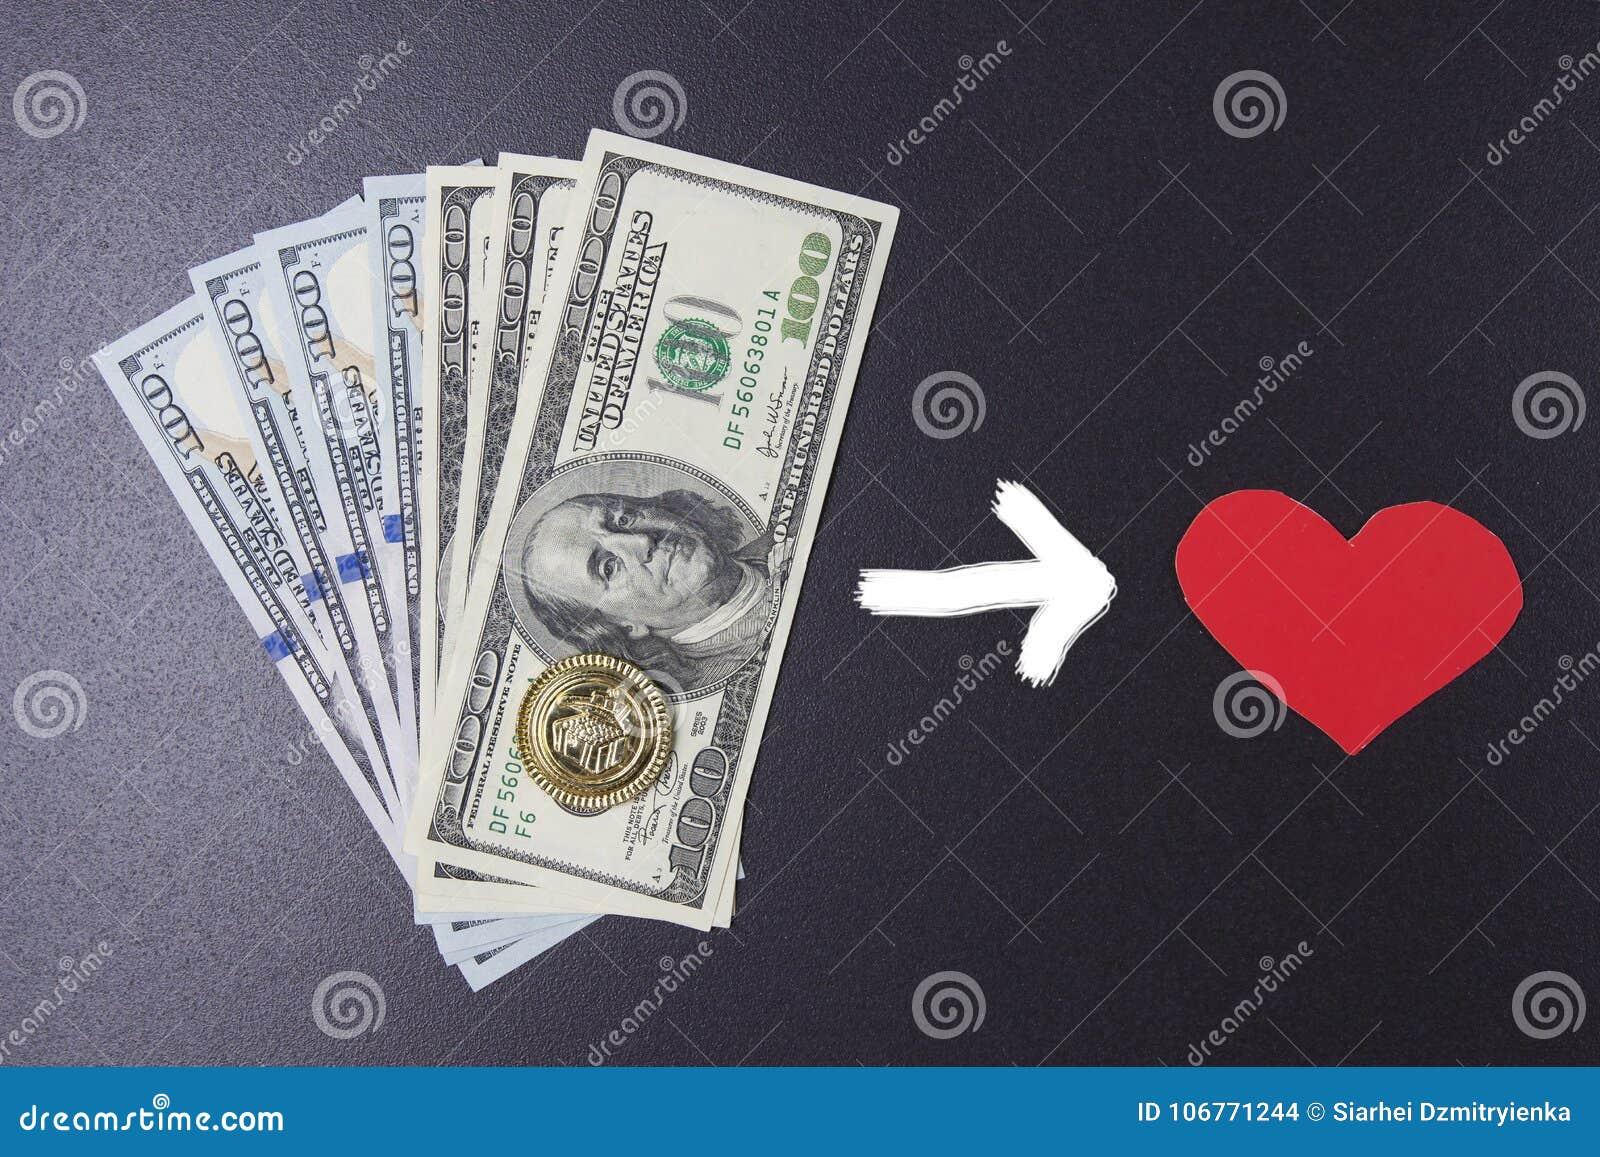 Love Dolars